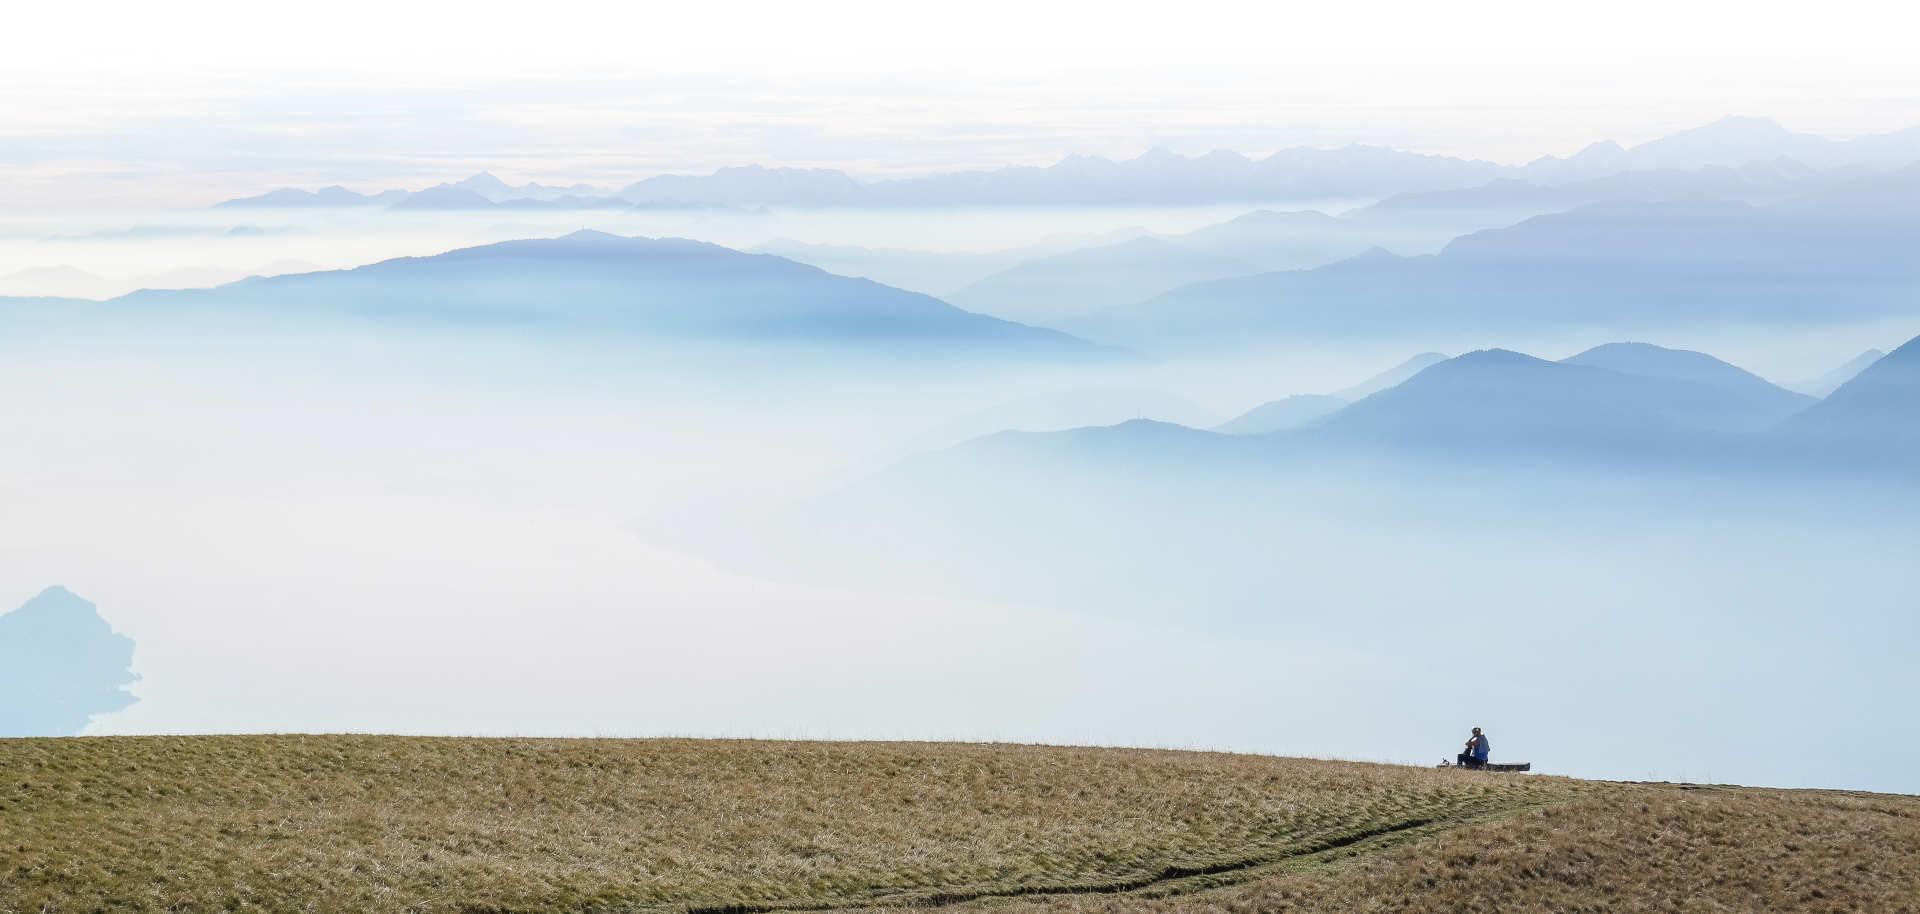 Persona sentada observando paisaje montañoso